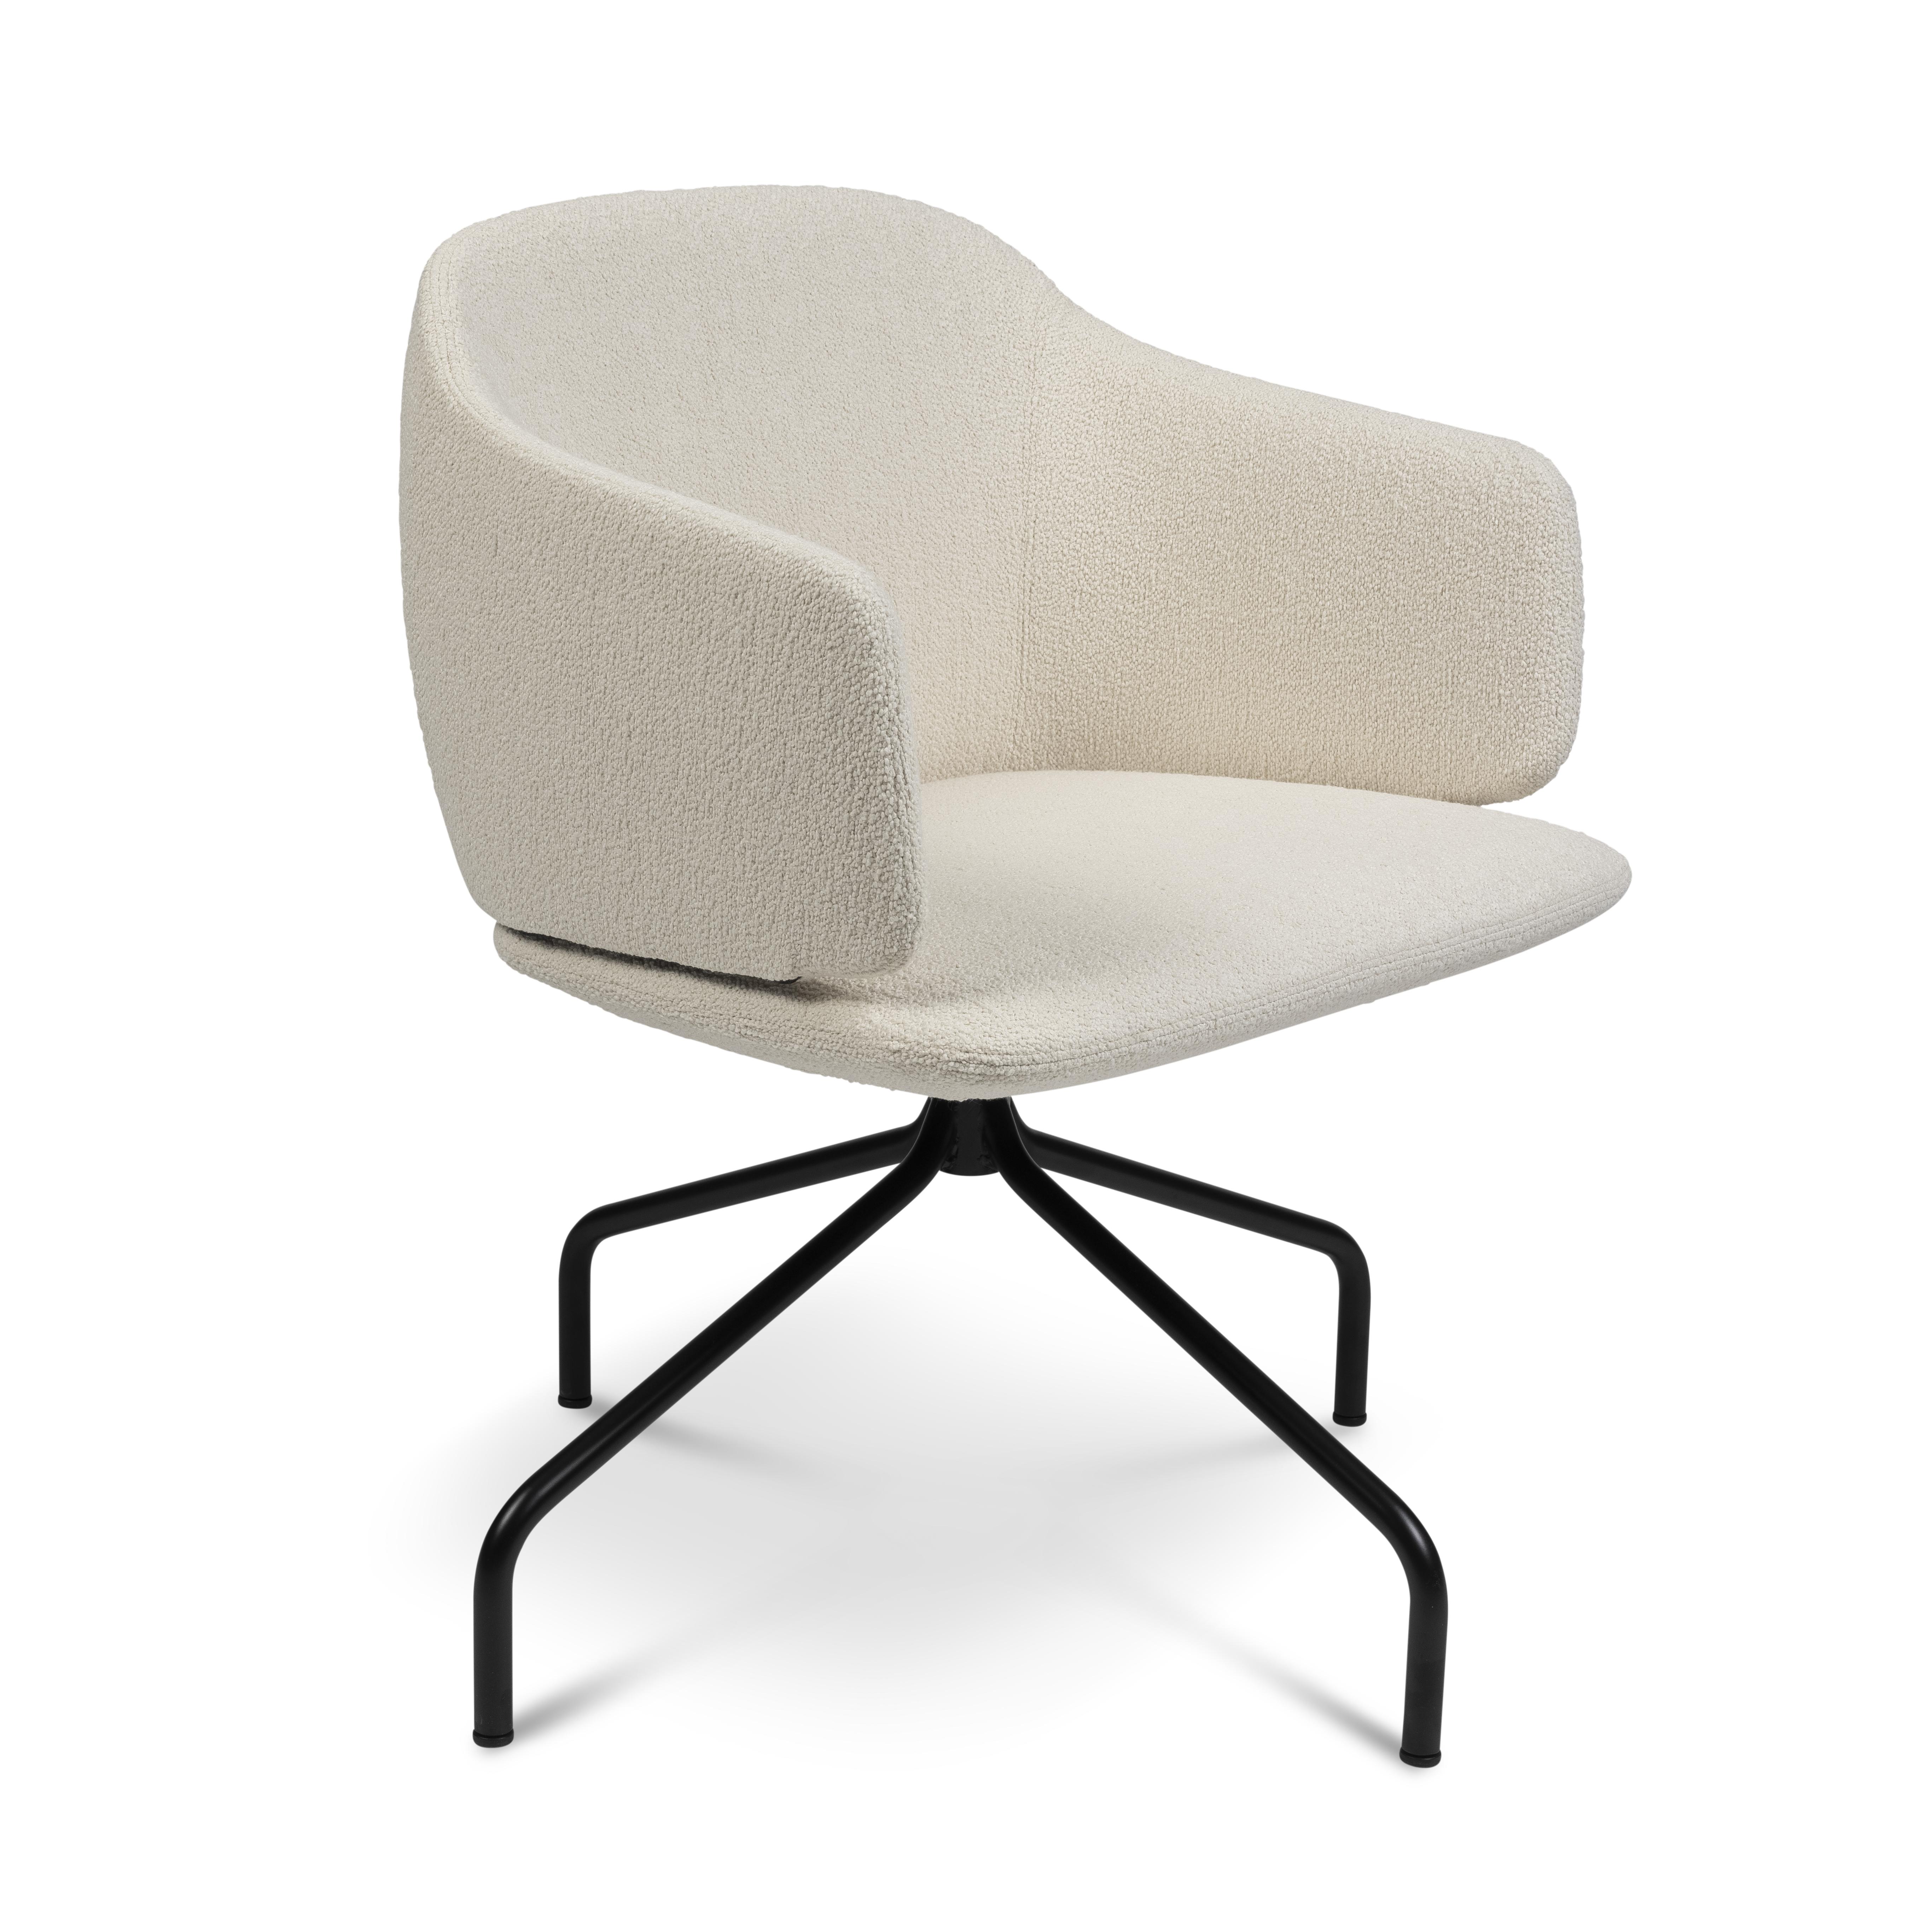 Dwell meet stol fra Fora Form skrå front